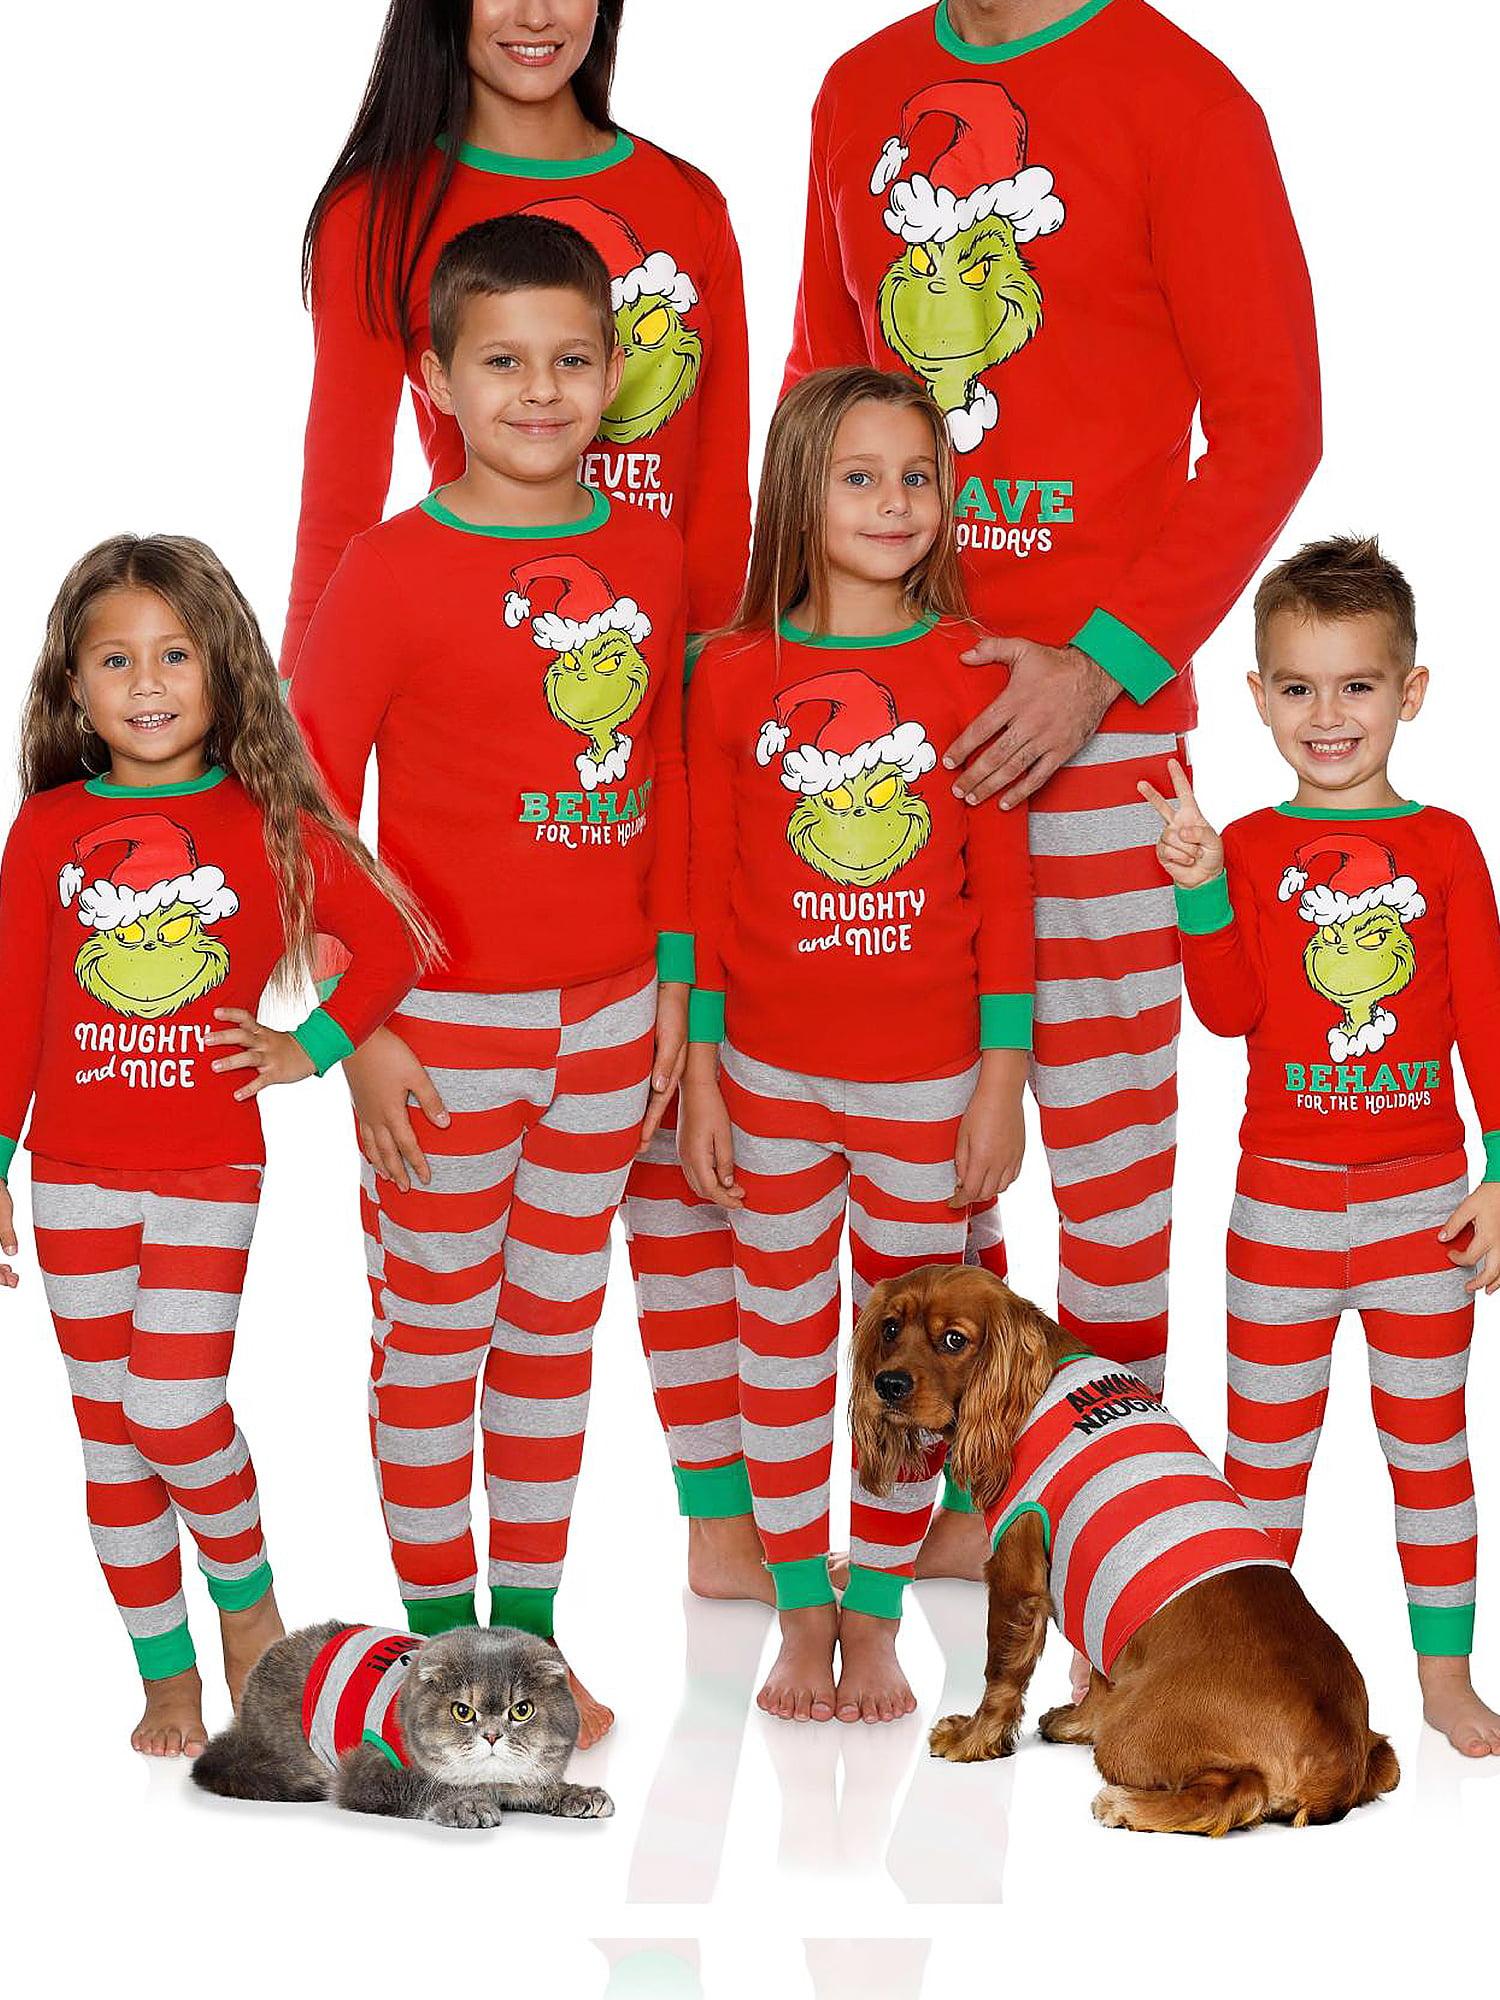 Details about  /Christmas Xmas Family Matching Pajamas Set Kids Baby Adults Sleepwear Nightwear